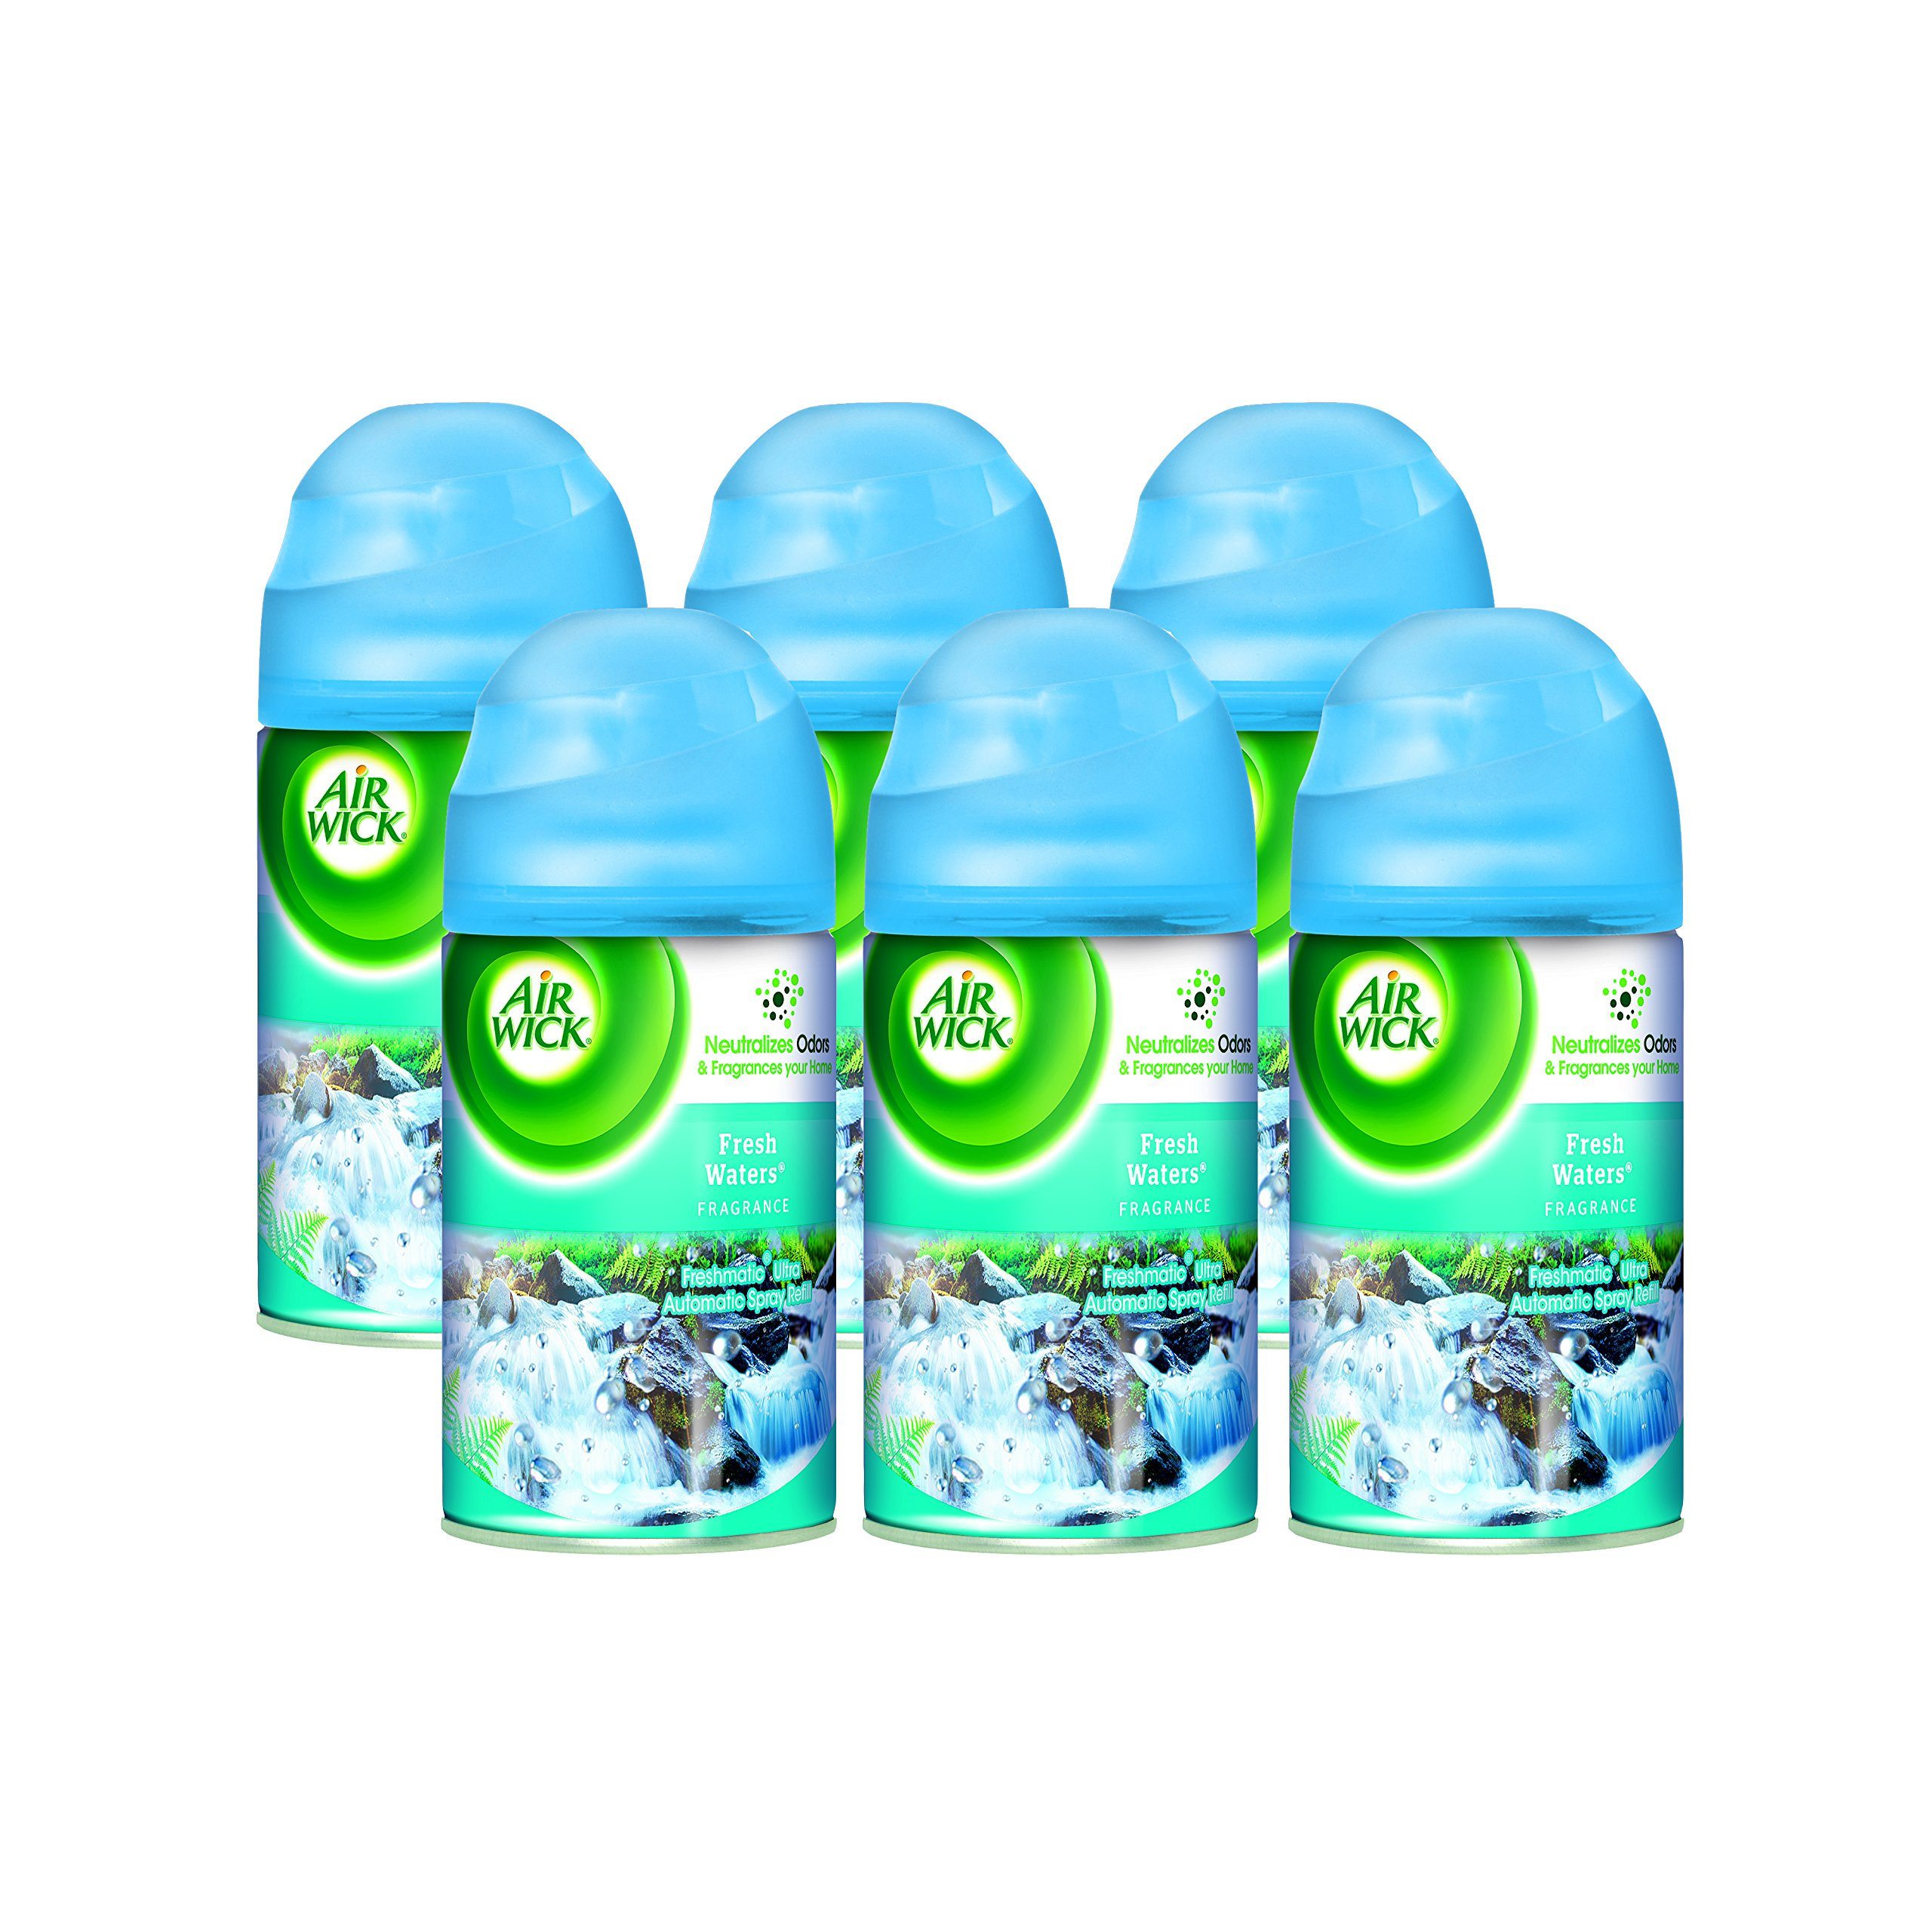 Air Wick Freshmatic Ultra Spray Refill, Fresh Waters, Aerosol, 6.17 oz. (Pack of 6)